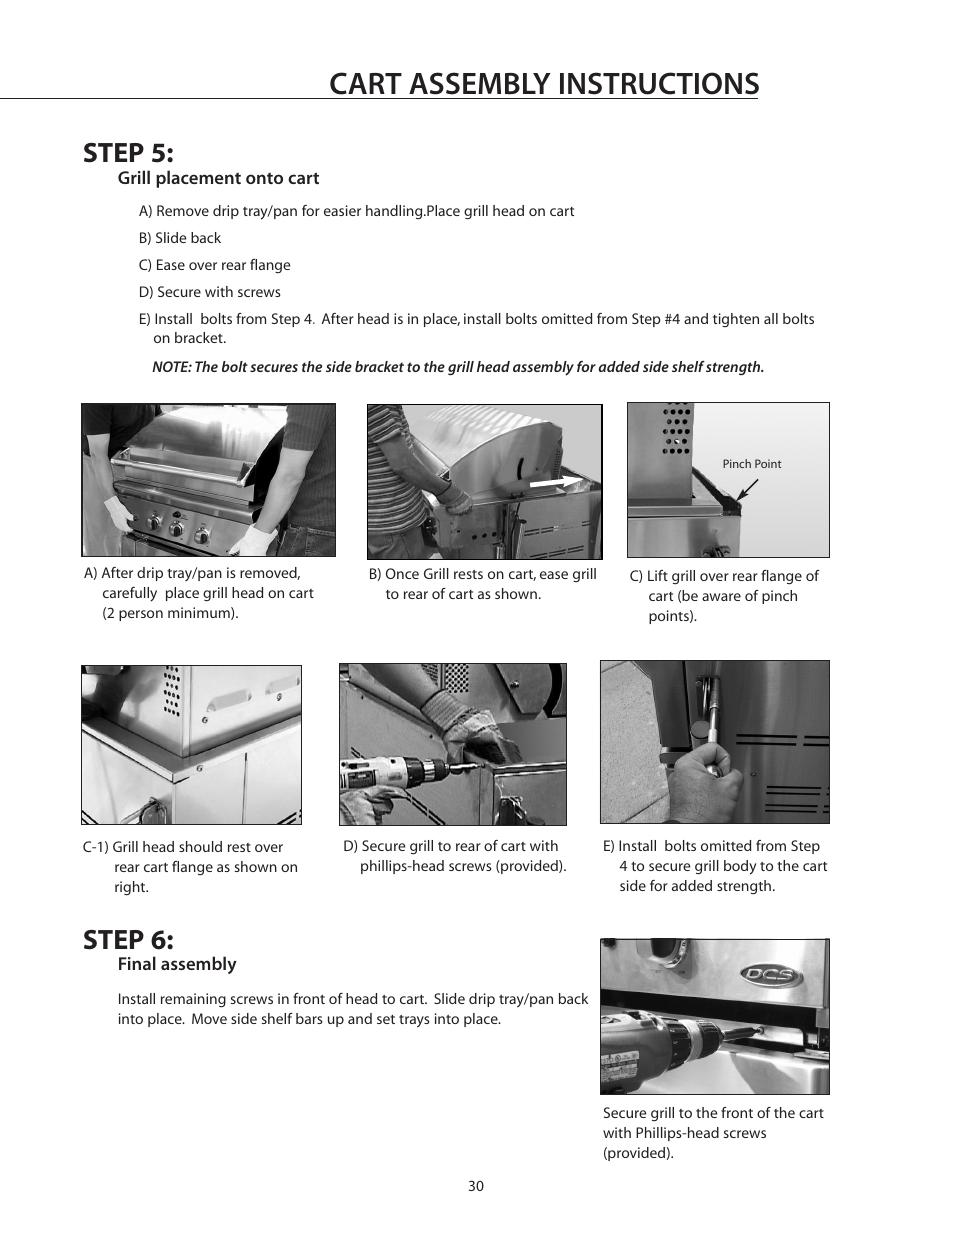 Cart assembly instructions, Step 5, Step 6   DCS BGB30-BQR User